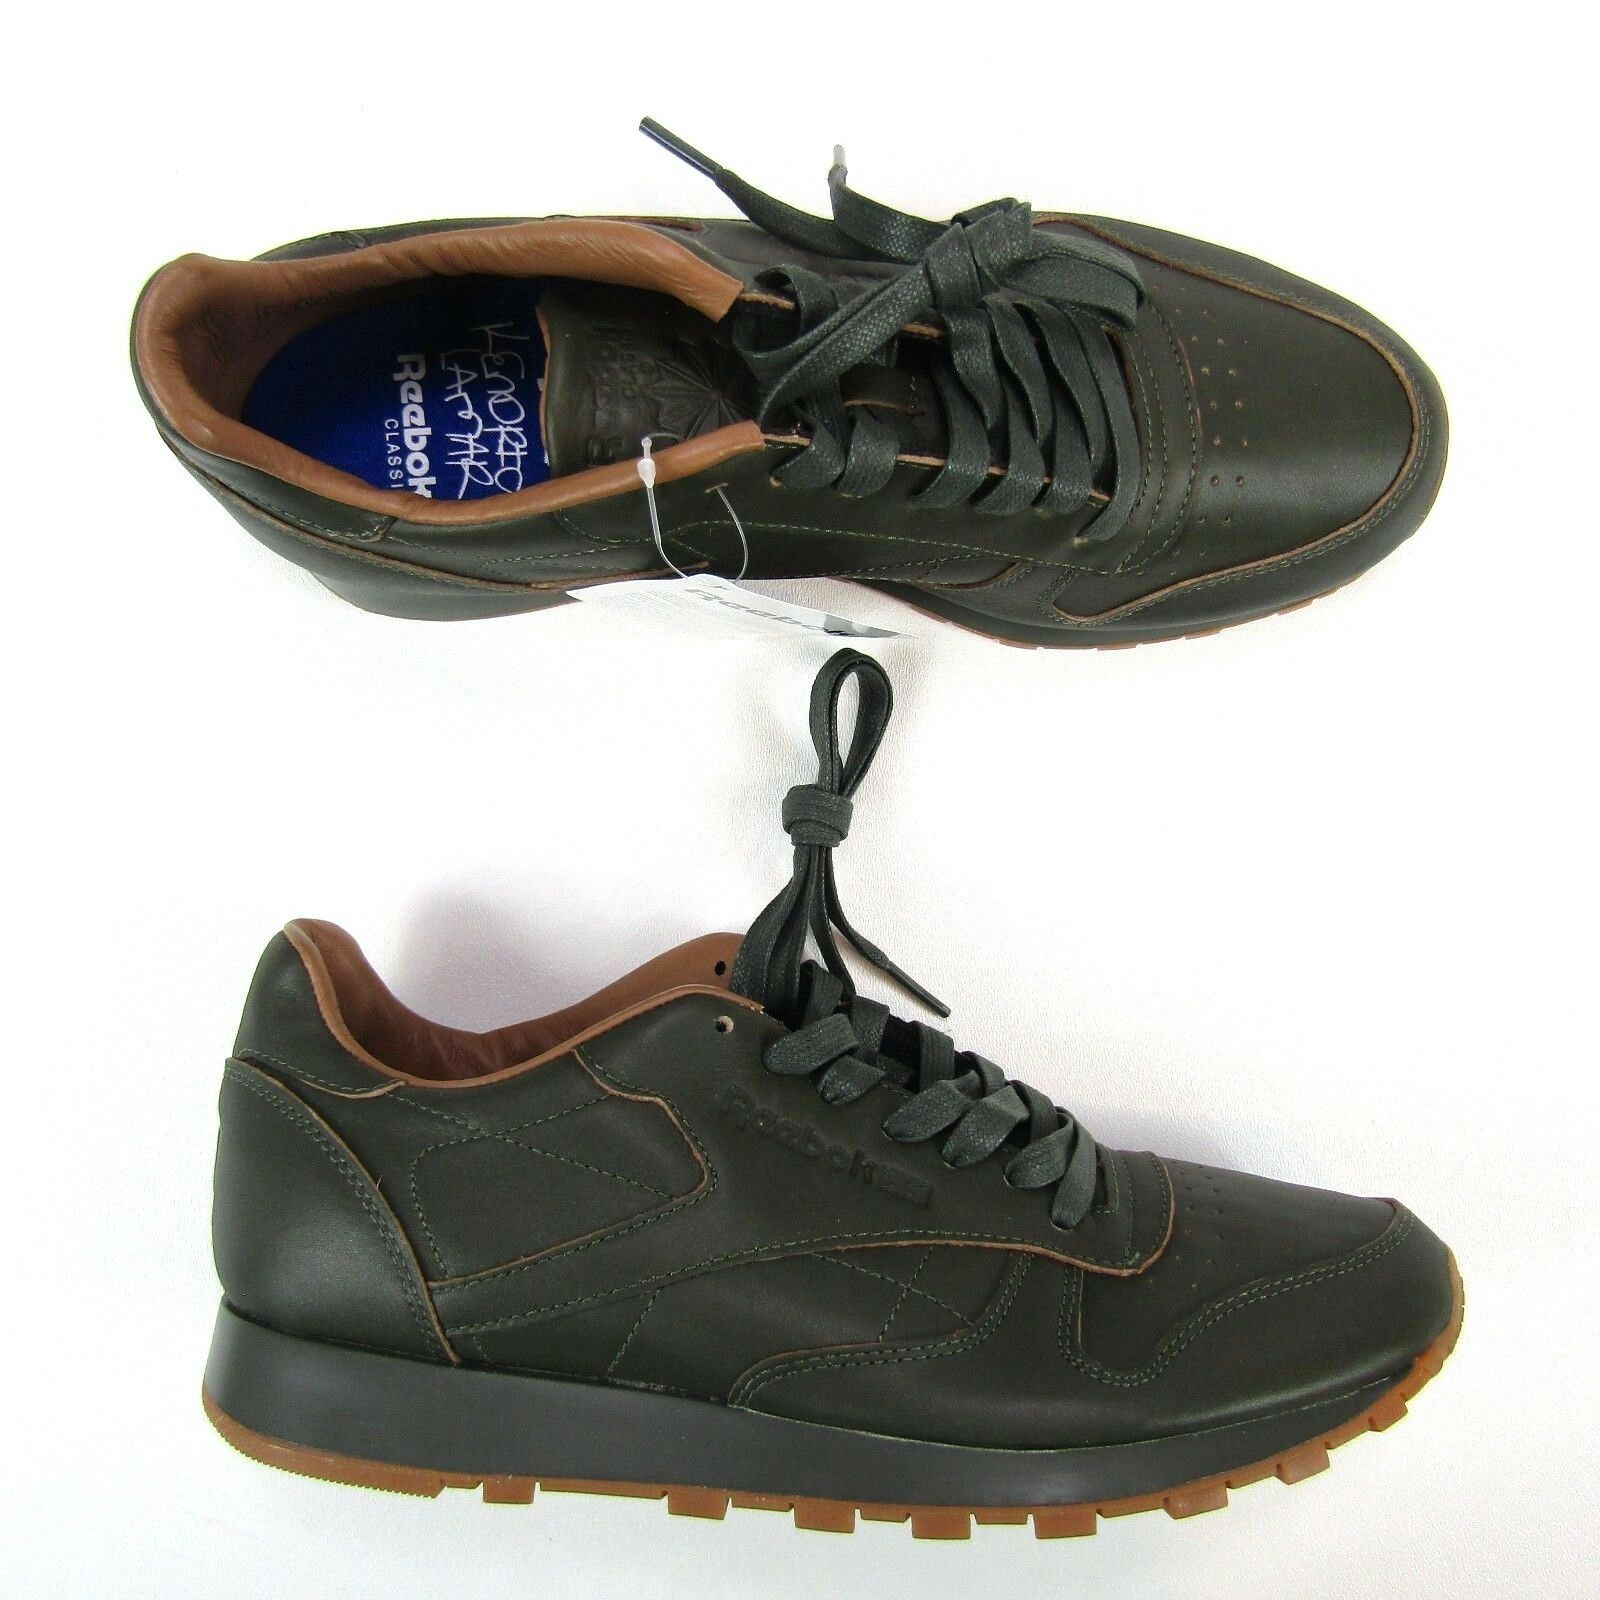 Reebok Classic Uomo Shoes Kendrick Lamar Size 7.5  Pelle Olive Green Gum